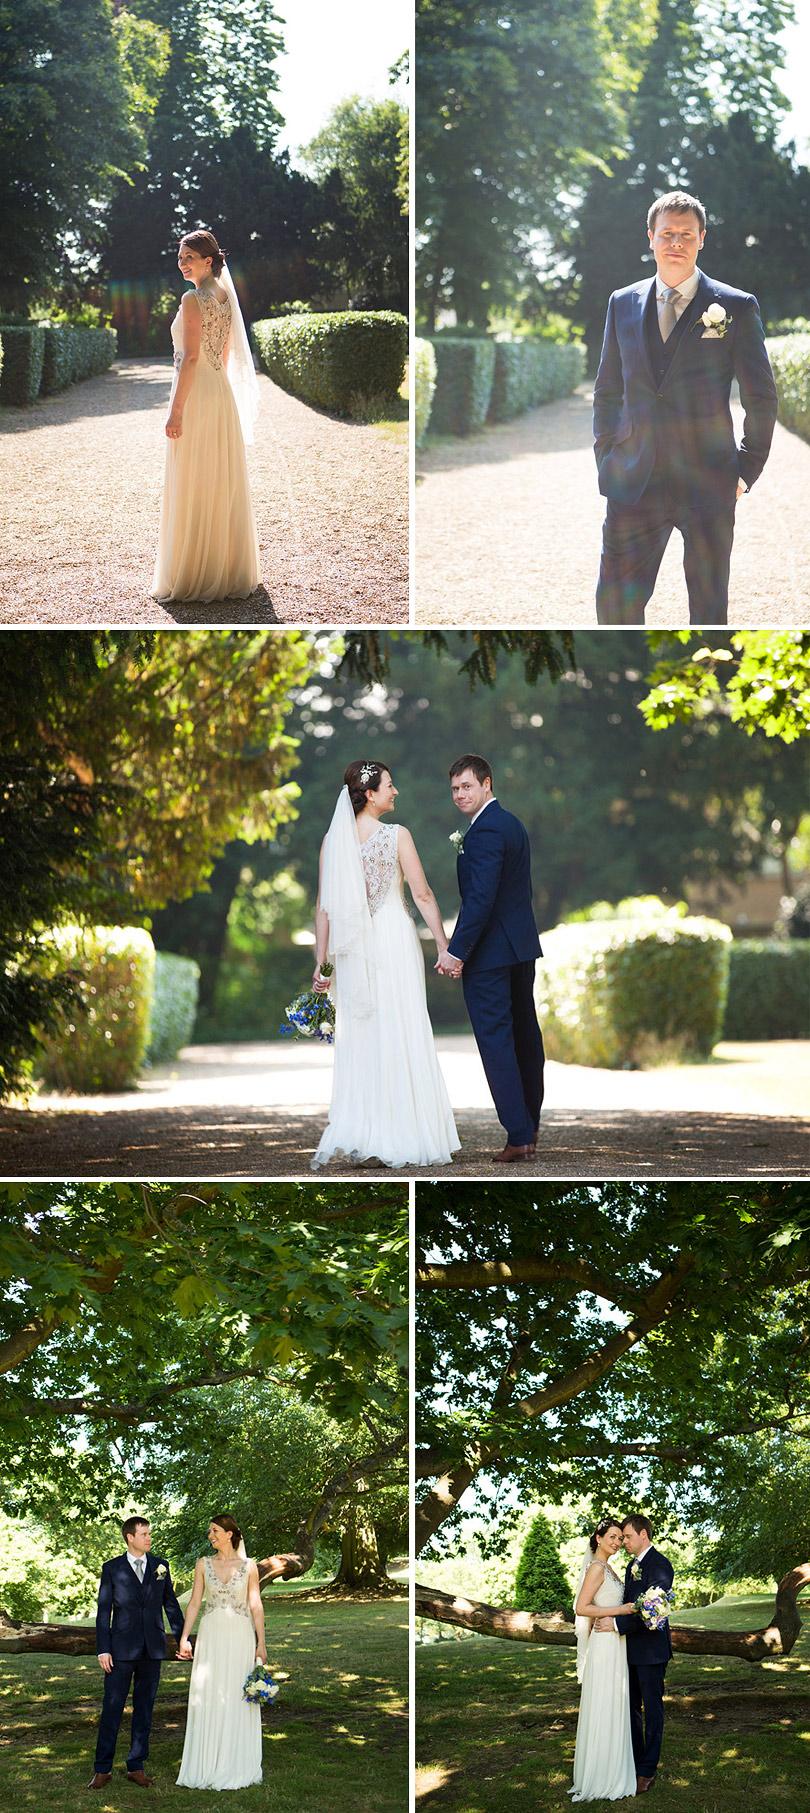 Oatlands-Park-Hotel-Wedding_LilyandFrankPhotography_11.jpg